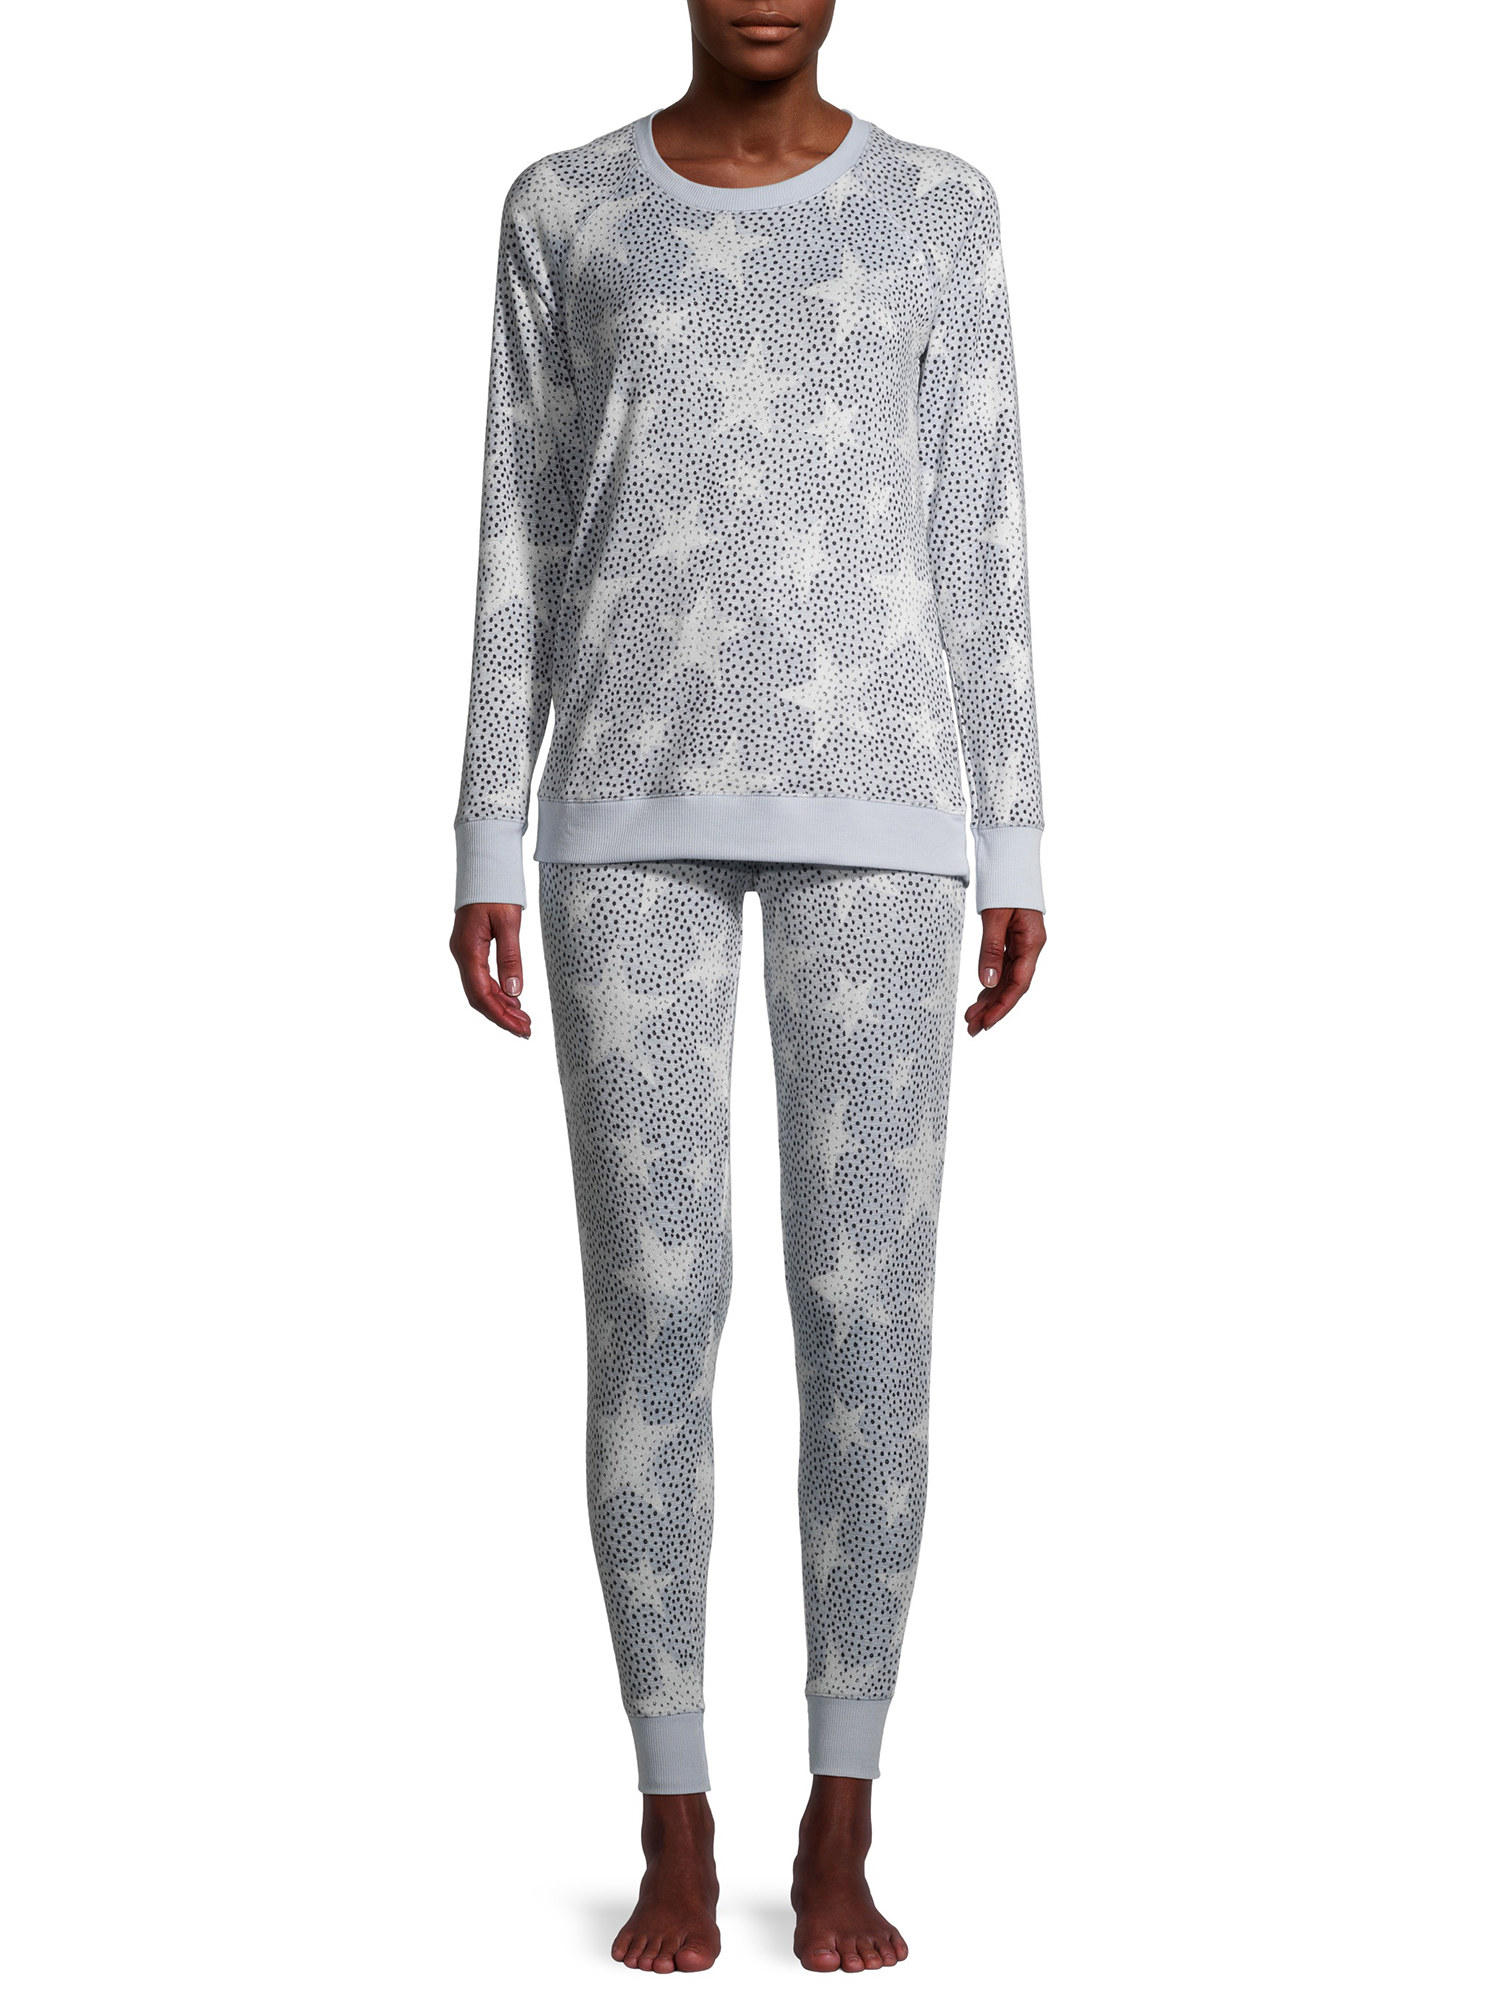 the pajama set with stars on it